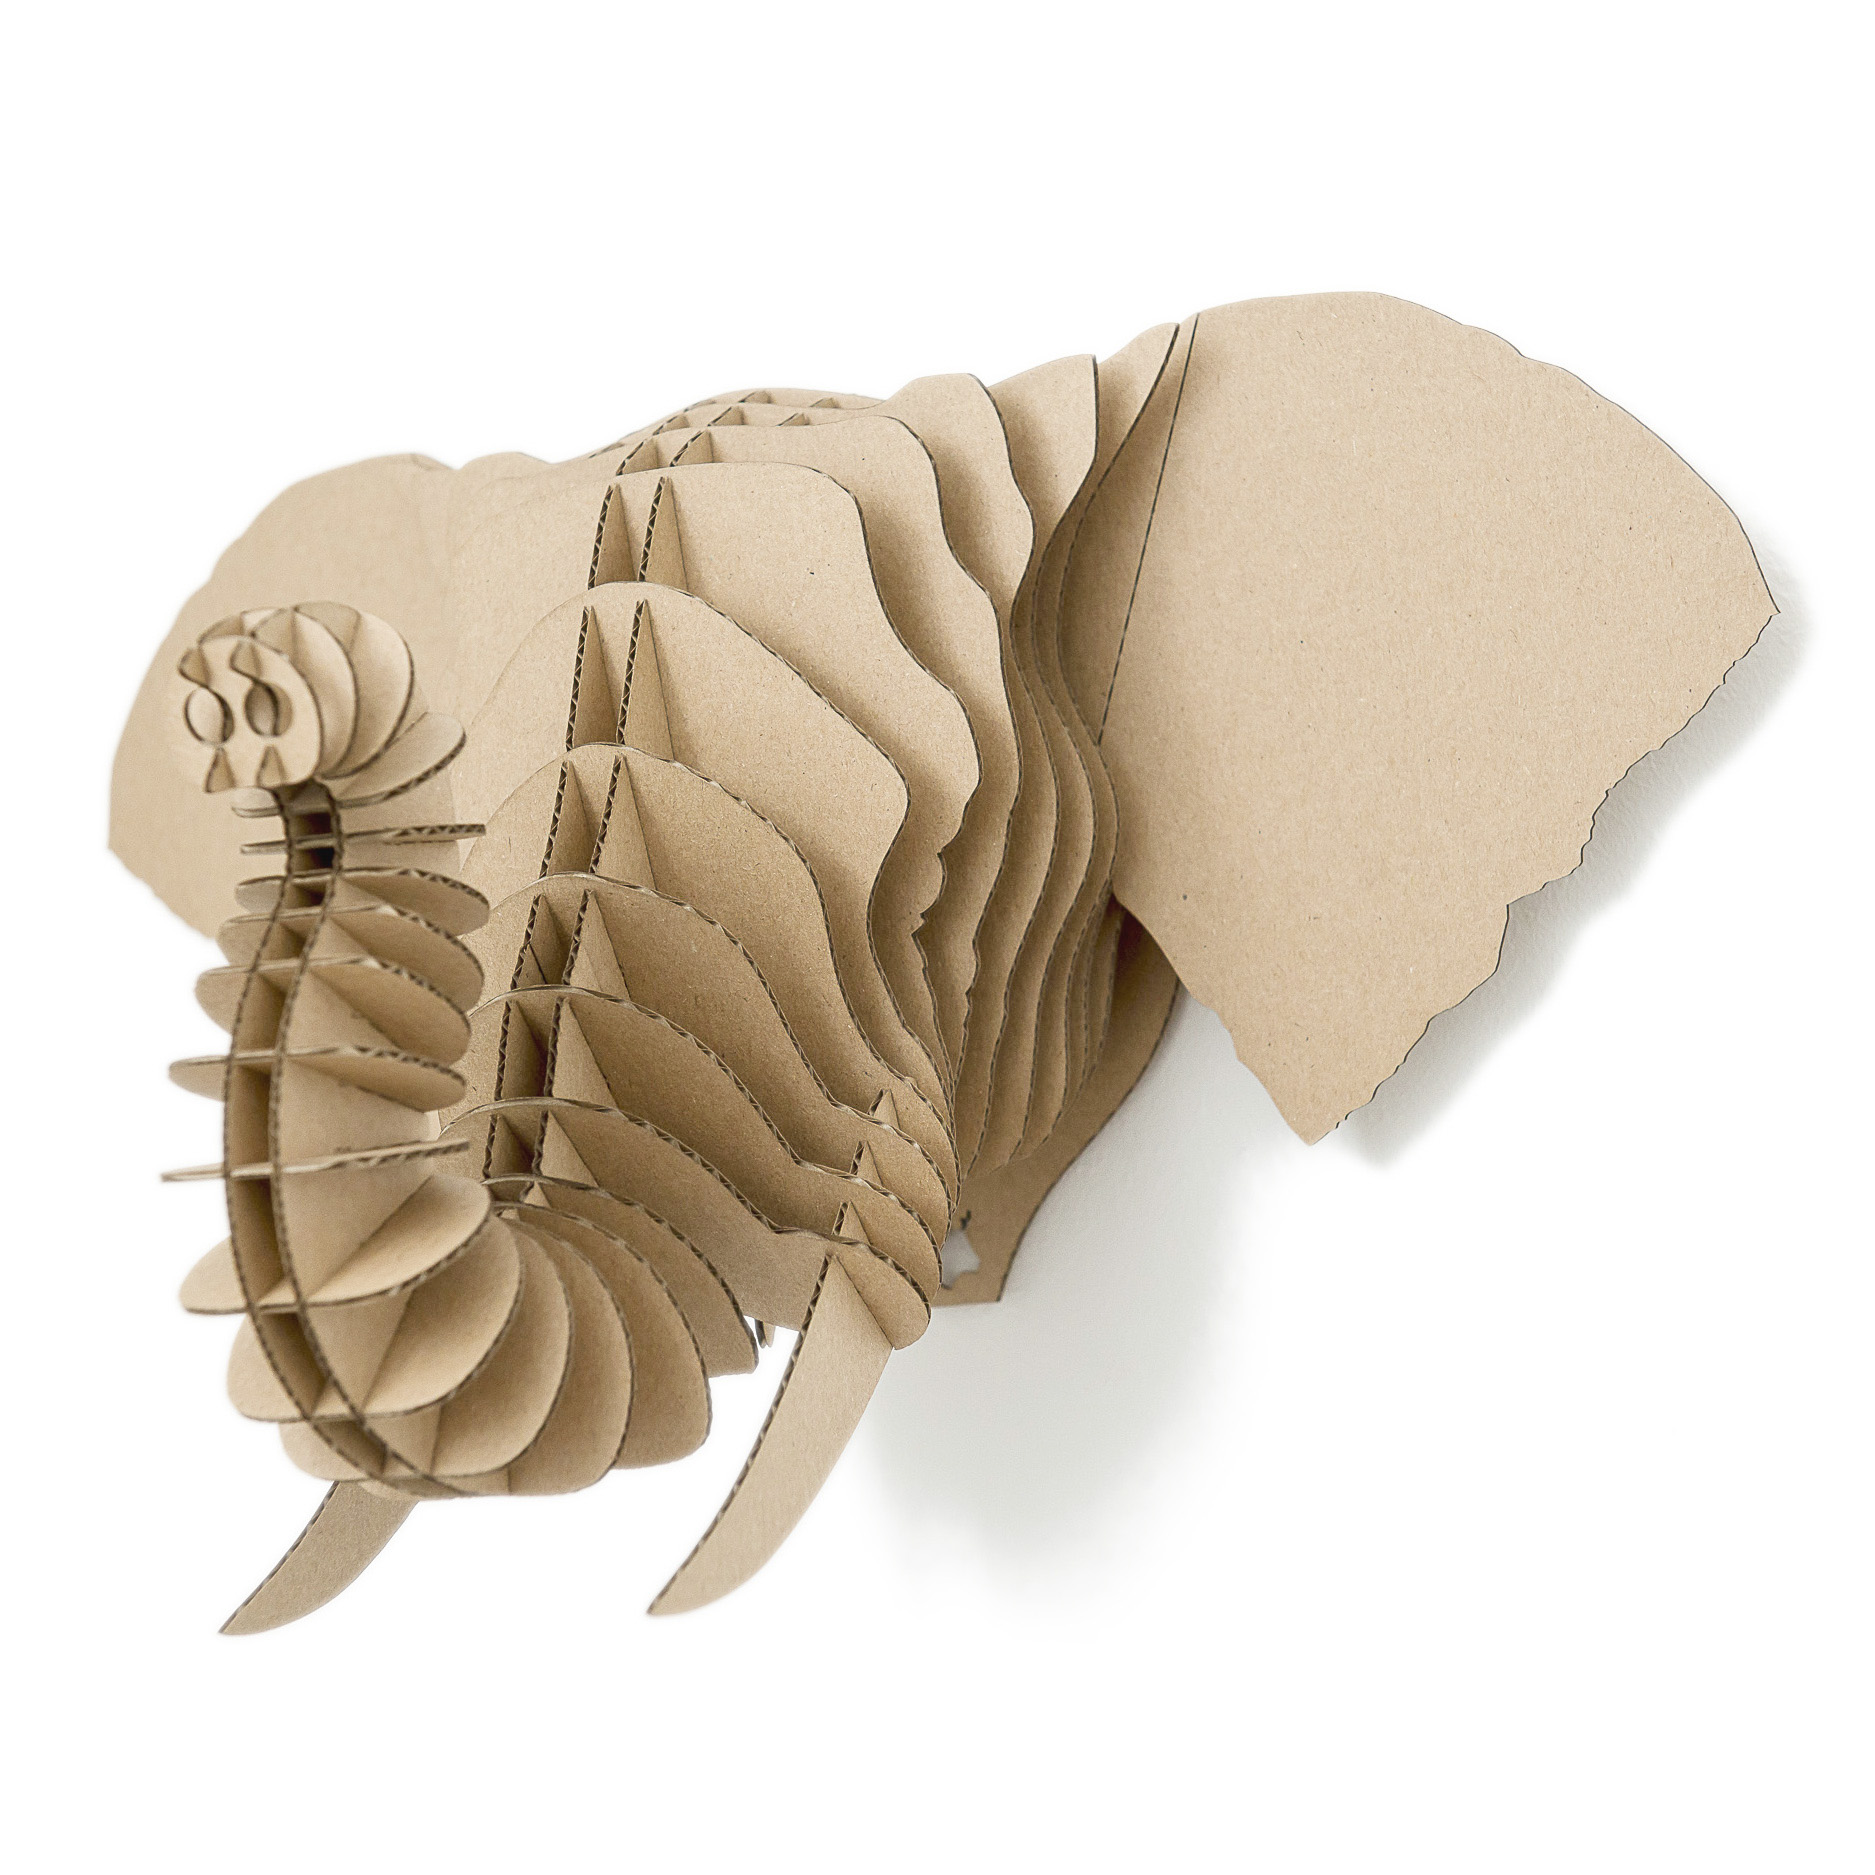 Frank - cardboard elephant trophy. Animal head for self assembly.